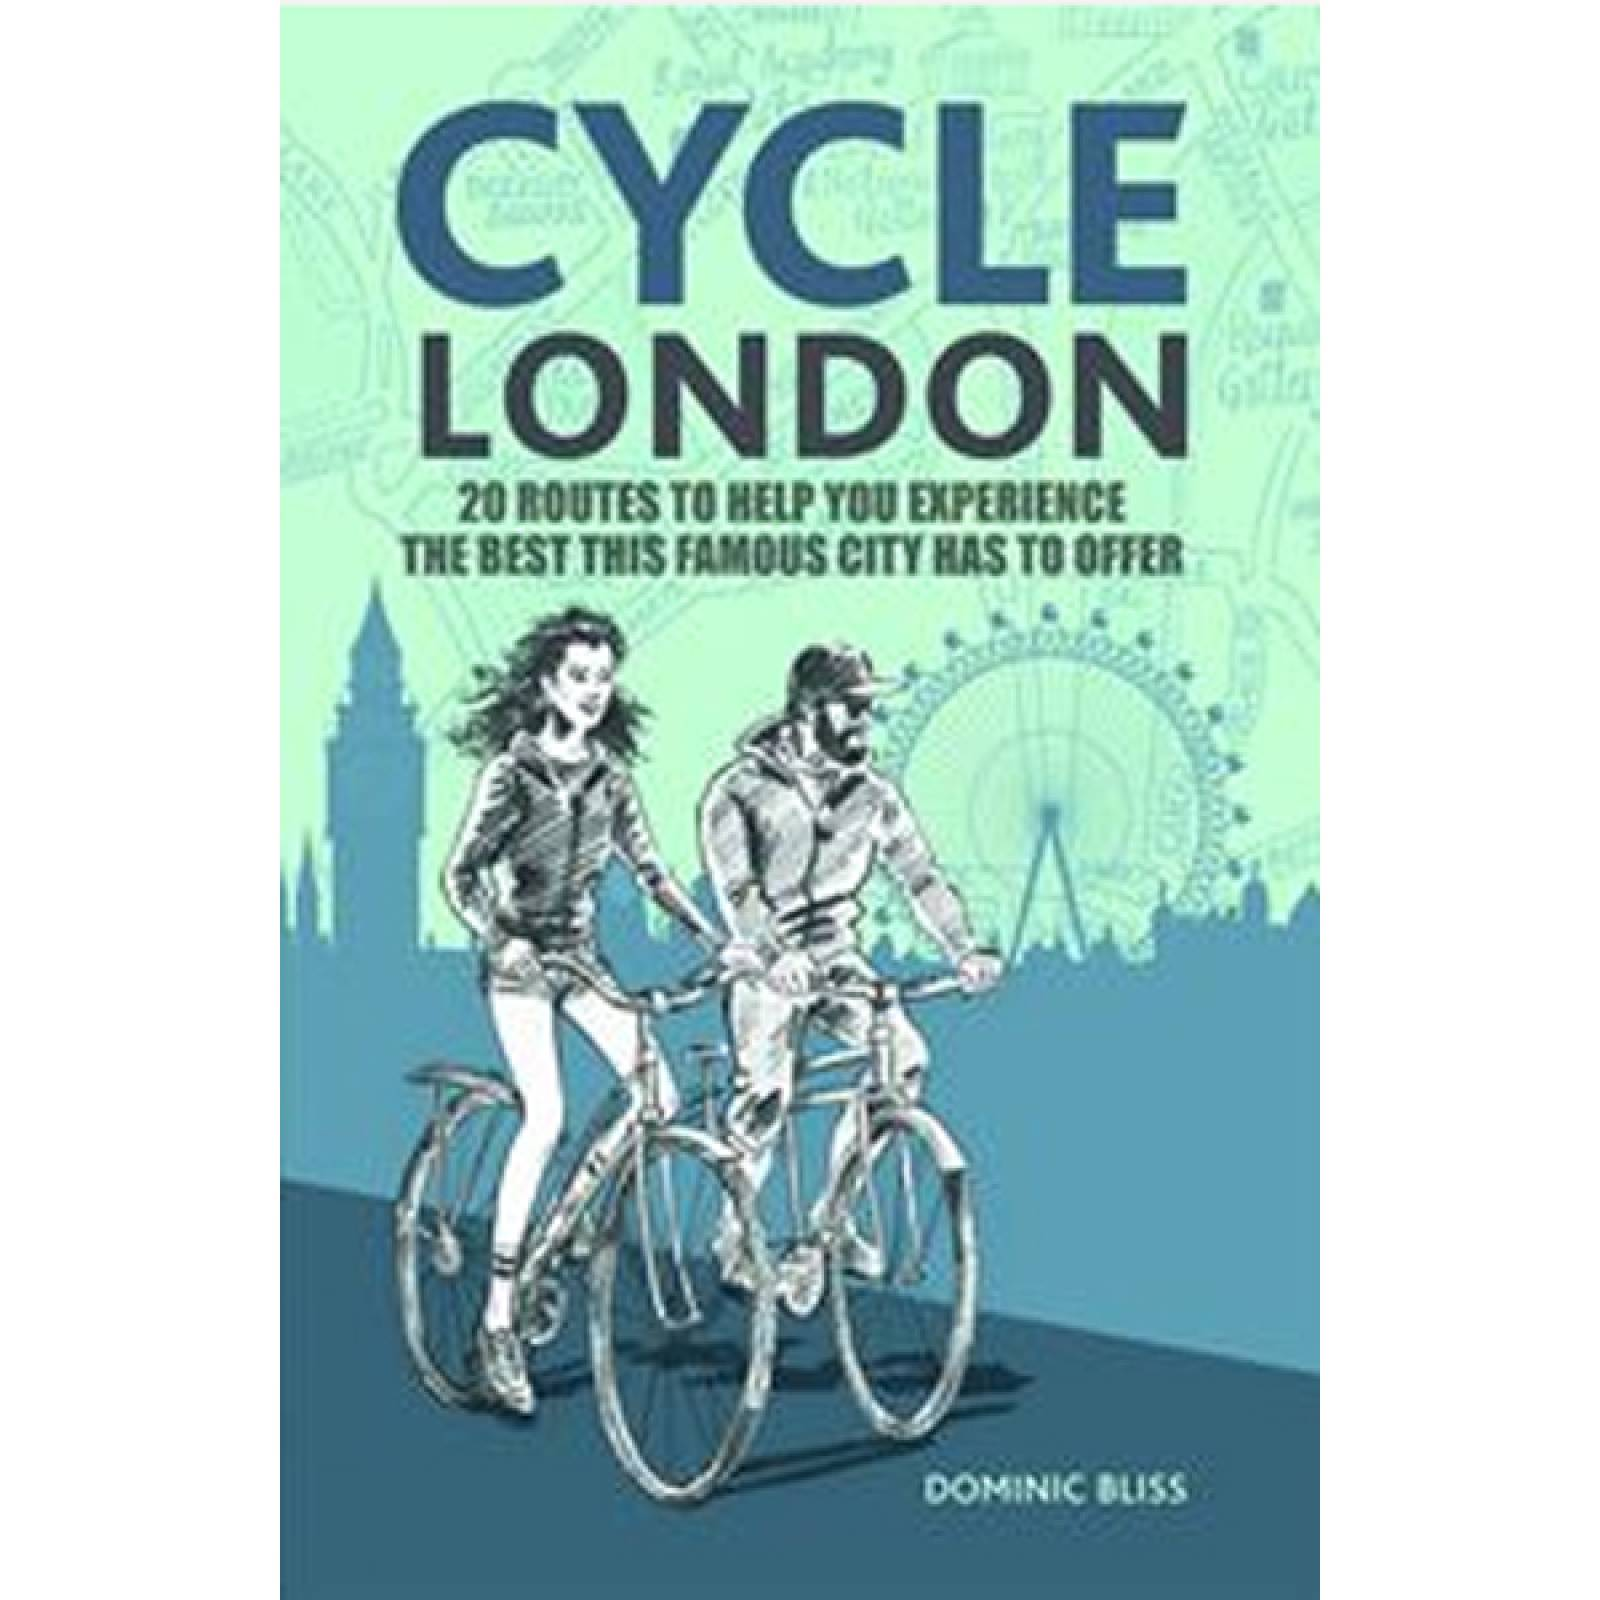 Z DISC Cycle London Paperback Book